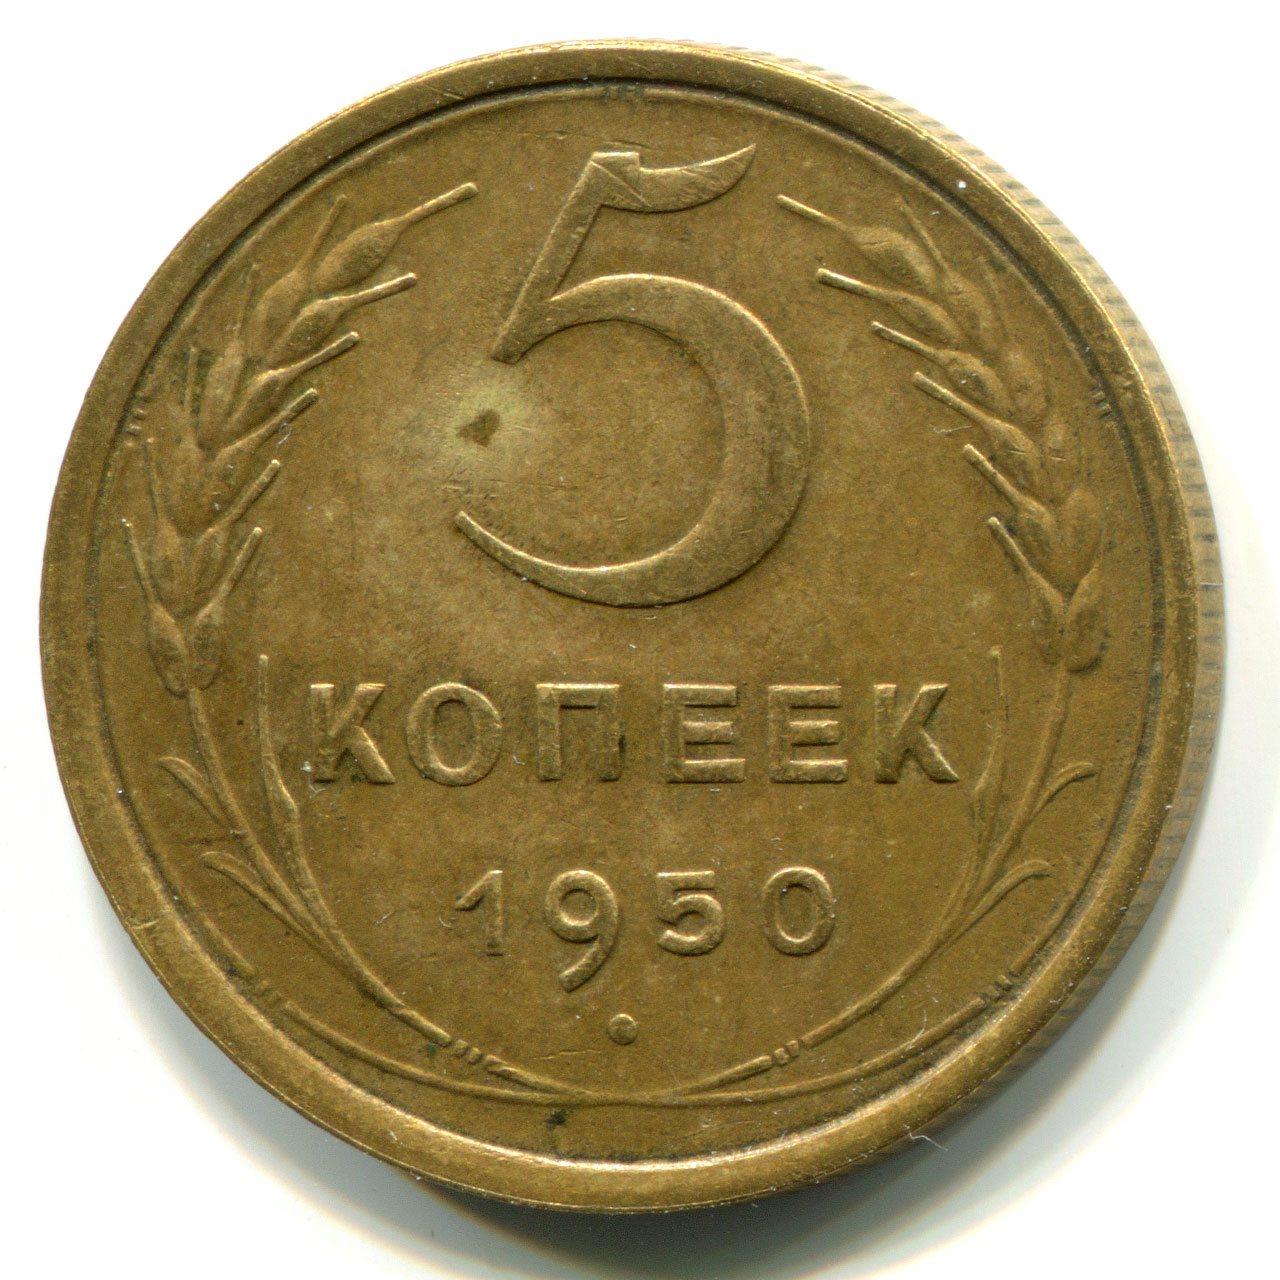 Аукцион соберуру - 20 копеек 1950 года